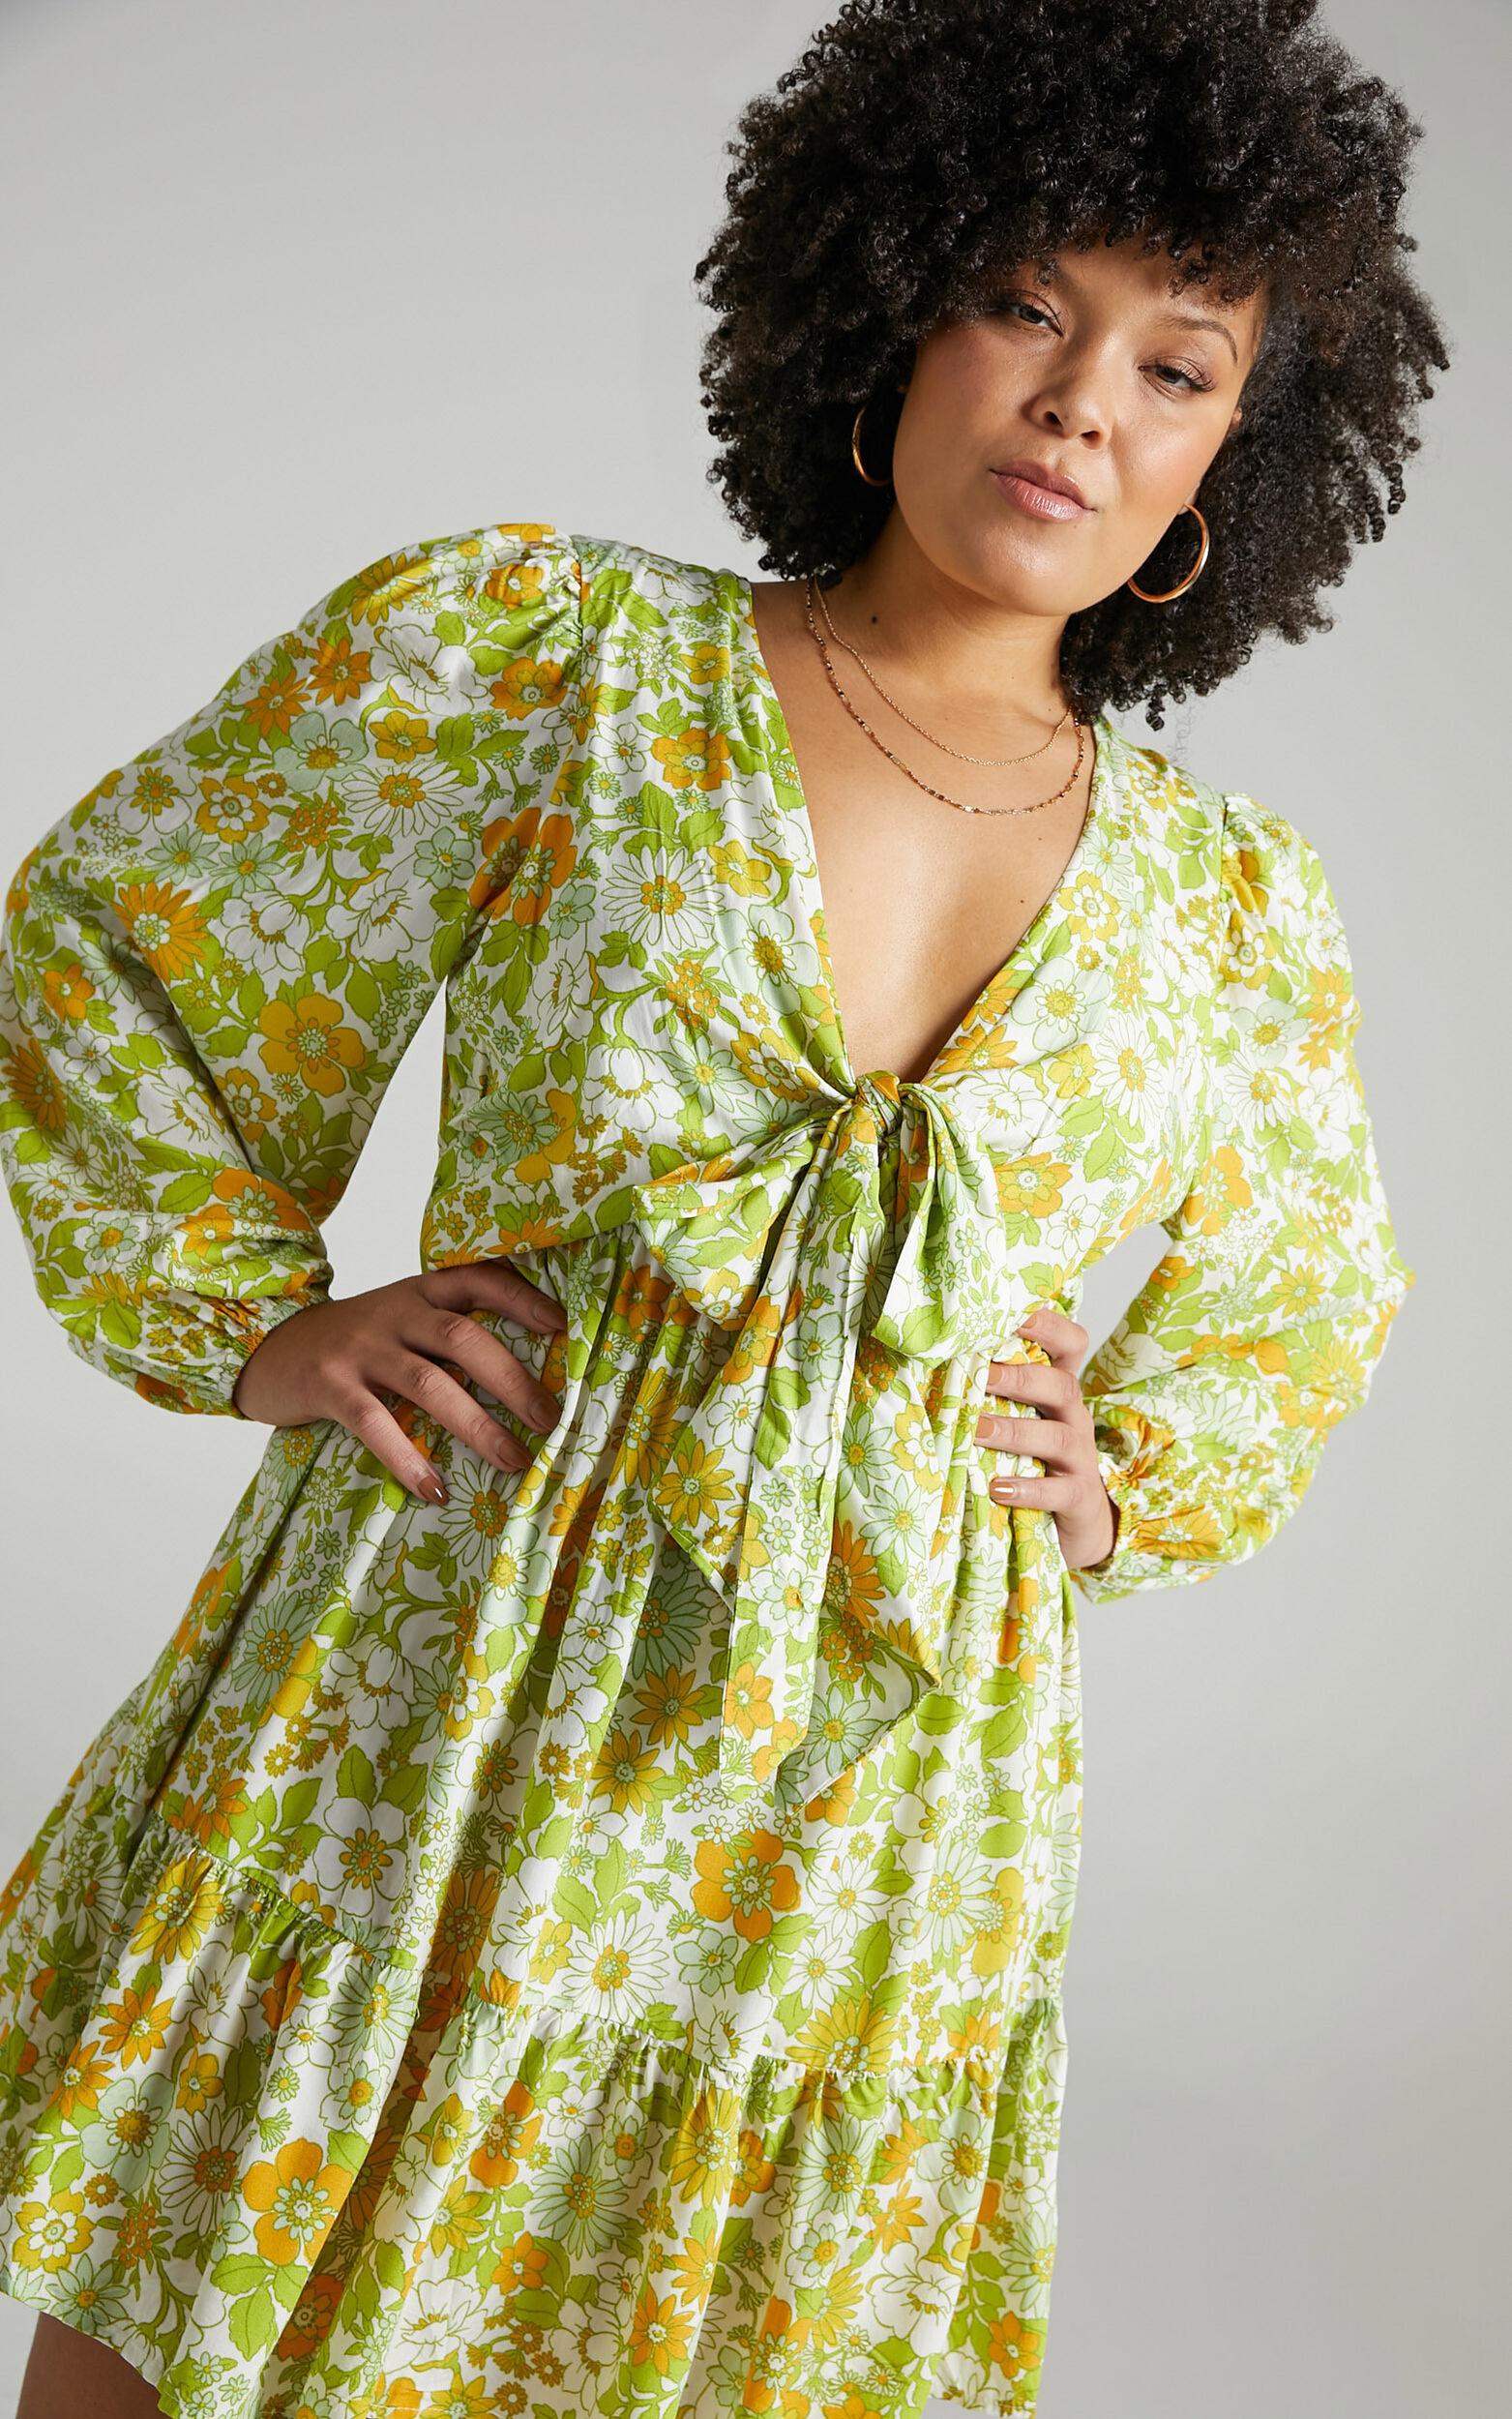 Sabella Rayon Dress in Harmony Floral - 04, MLT1, super-hi-res image number null